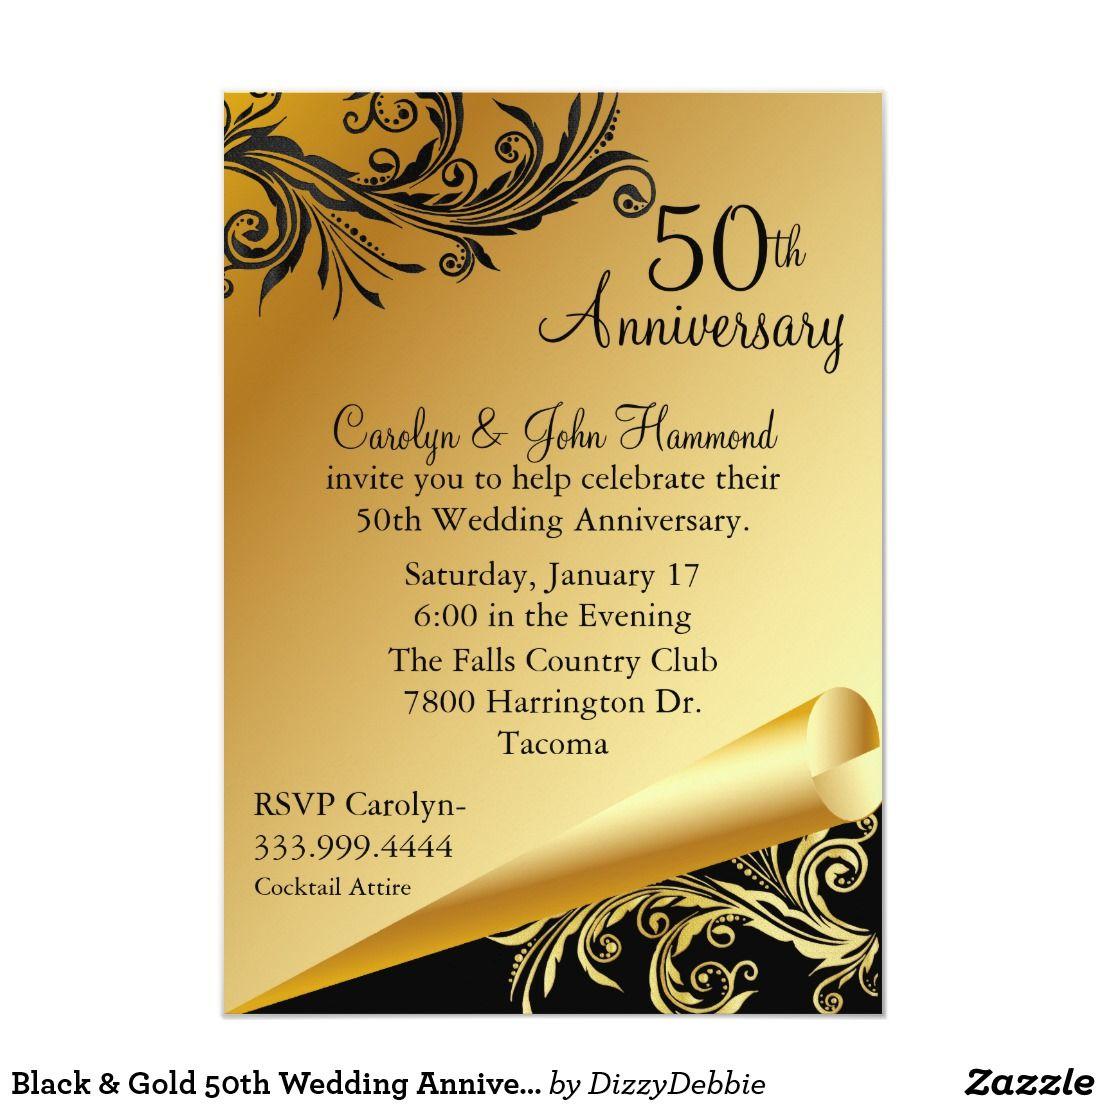 Black Gold 50th Wedding Anniversary Invitation Zazzle Com 50th Wedding Anniversary Invitations 50th Wedding Anniversary Wedding Anniversary Invitations